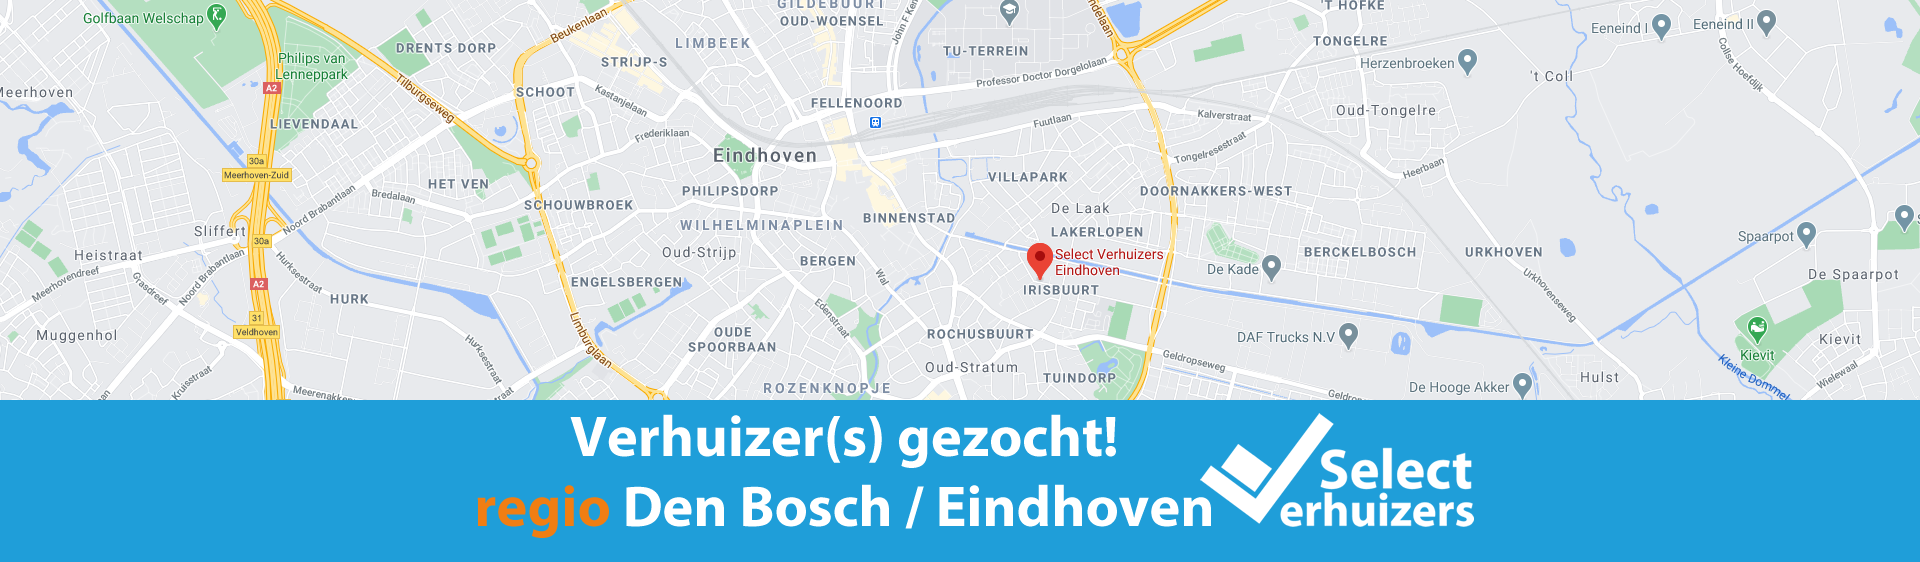 Verhuizers gezocht regio Den Bosch - Eindhoven